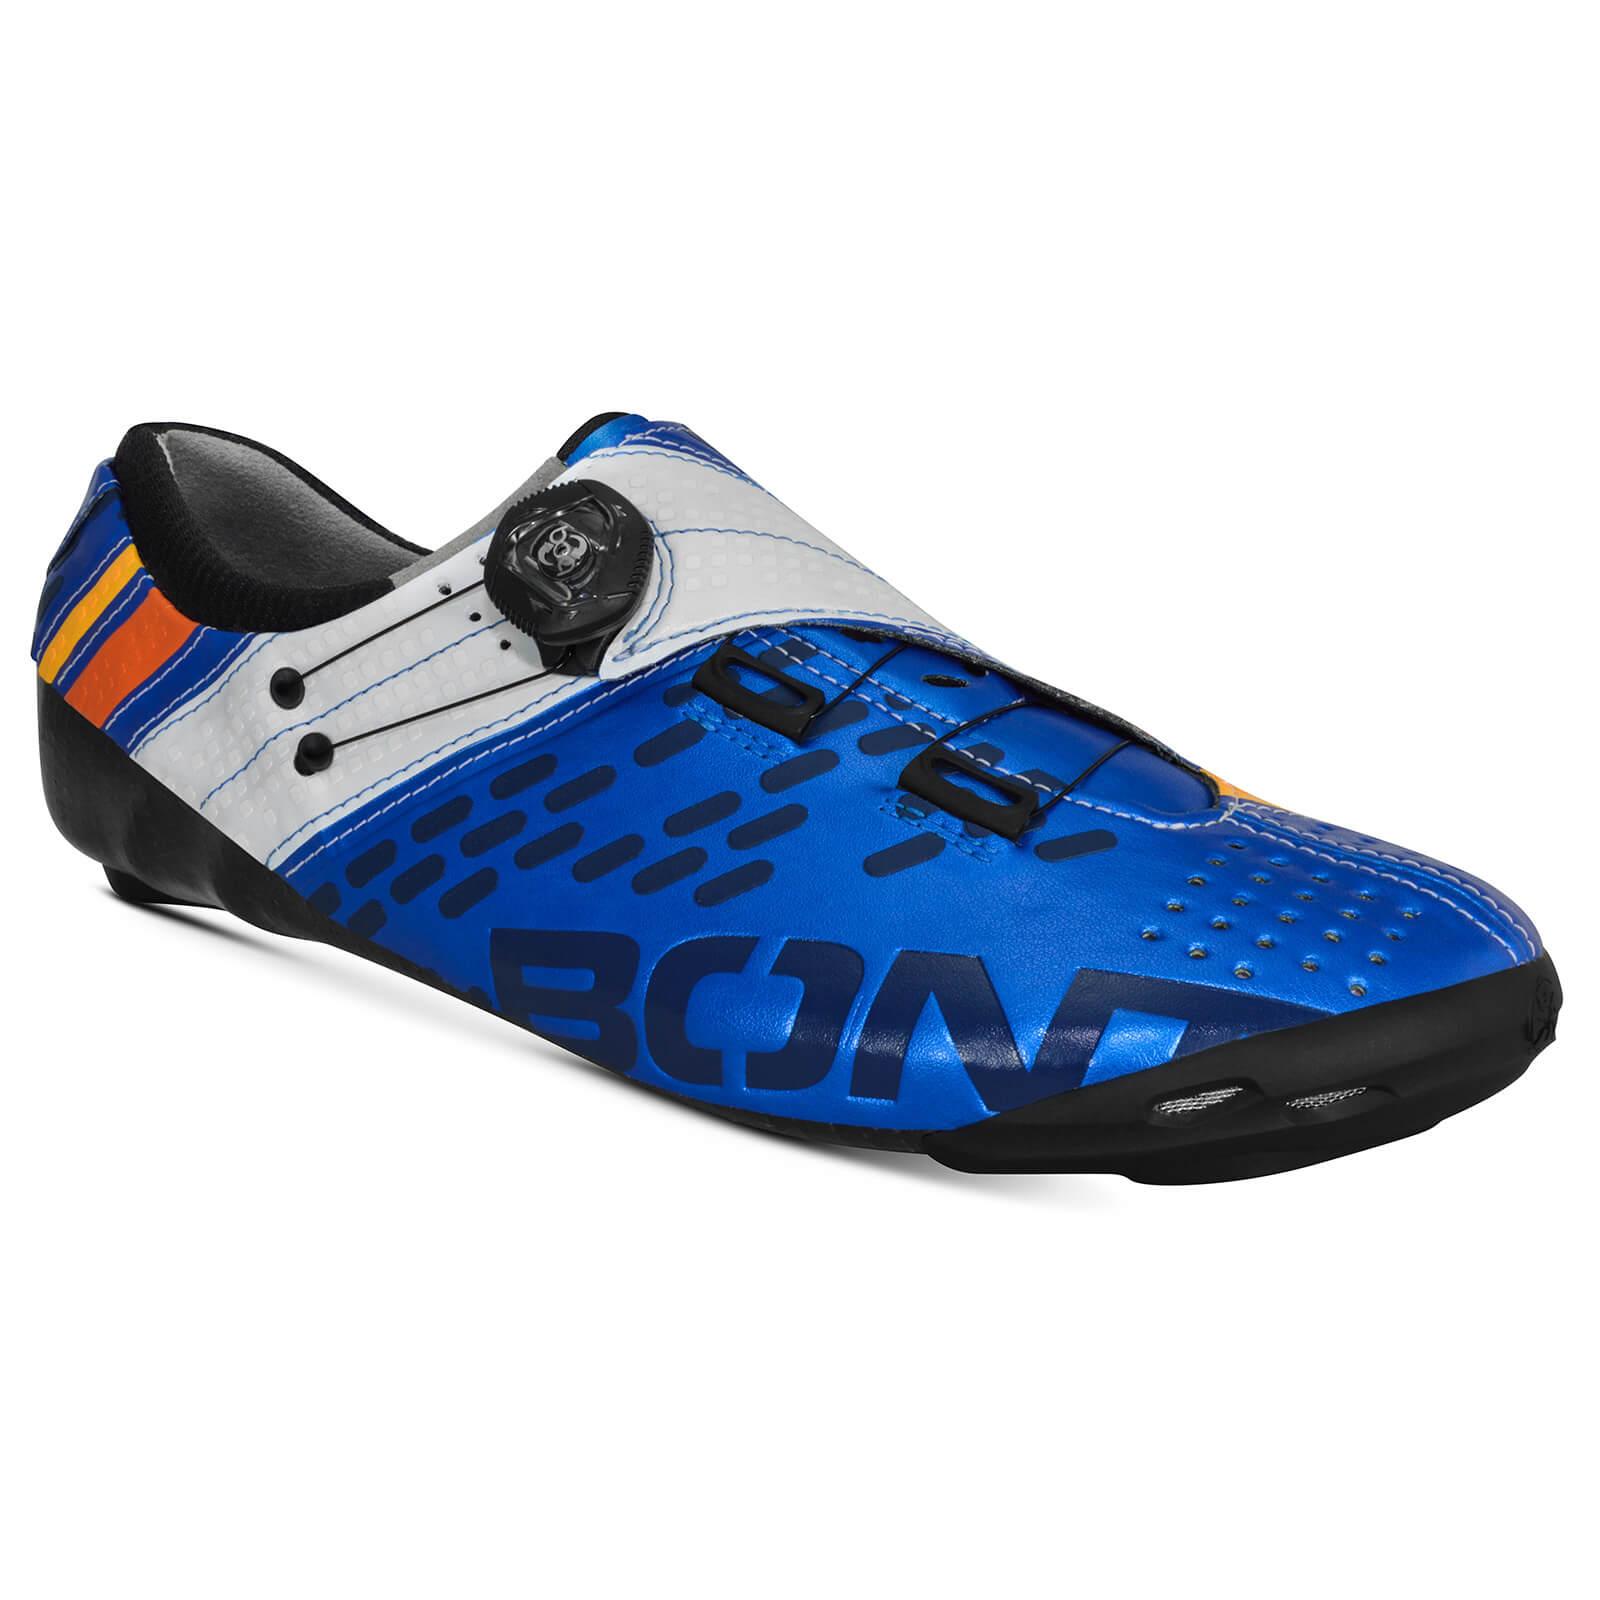 Bont Helix Road Shoes - EU 44 - Blue/White